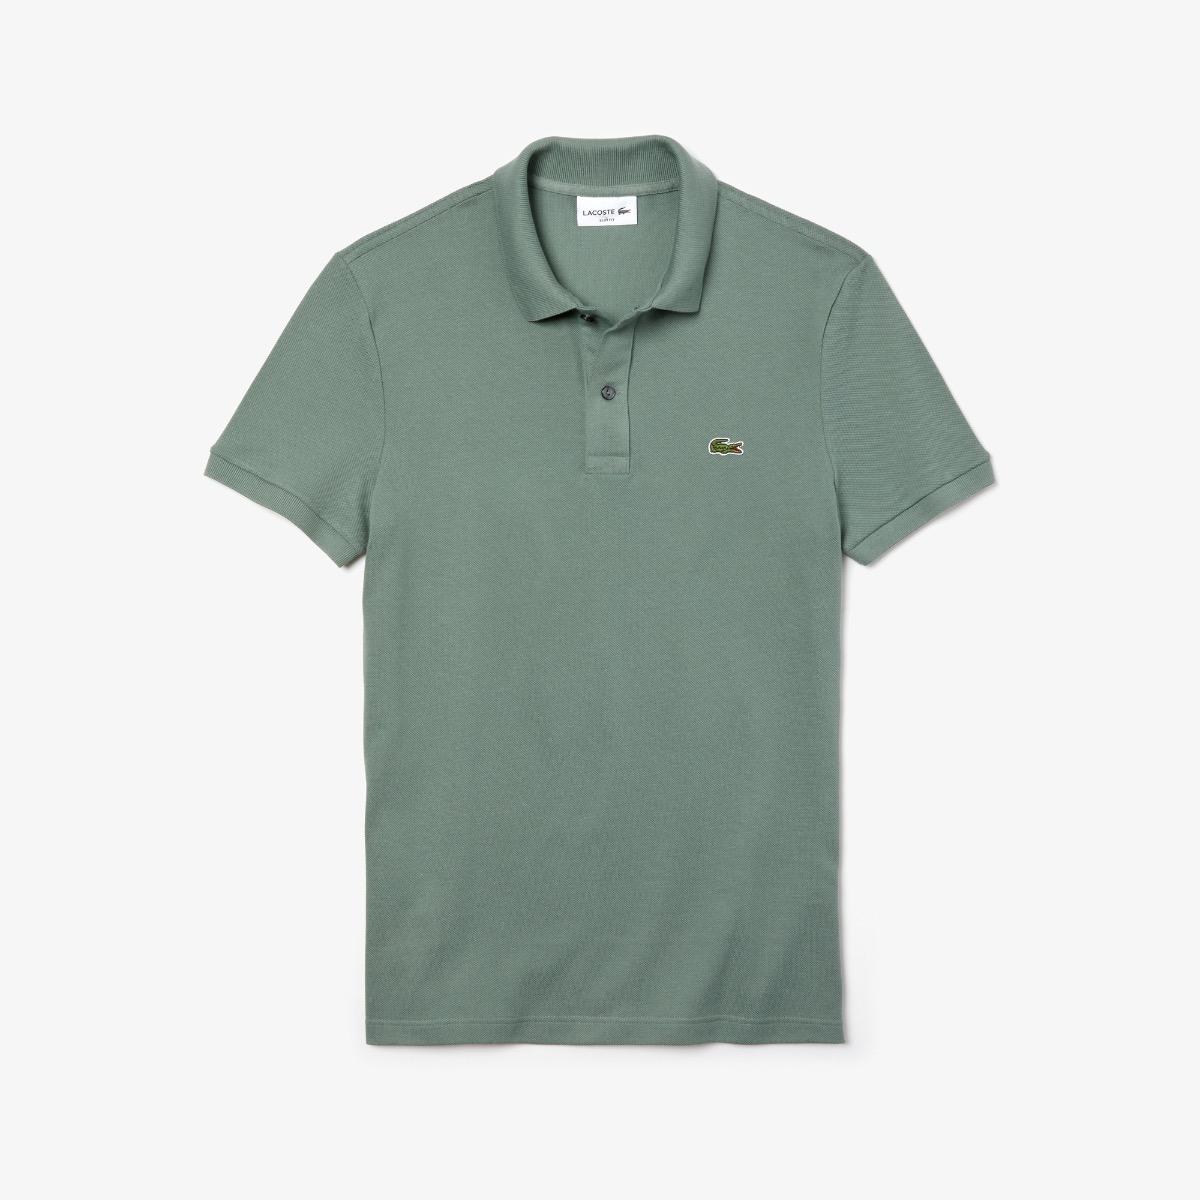 Lacoste Slim Fit Polo PH4012 307 Khaki Groen